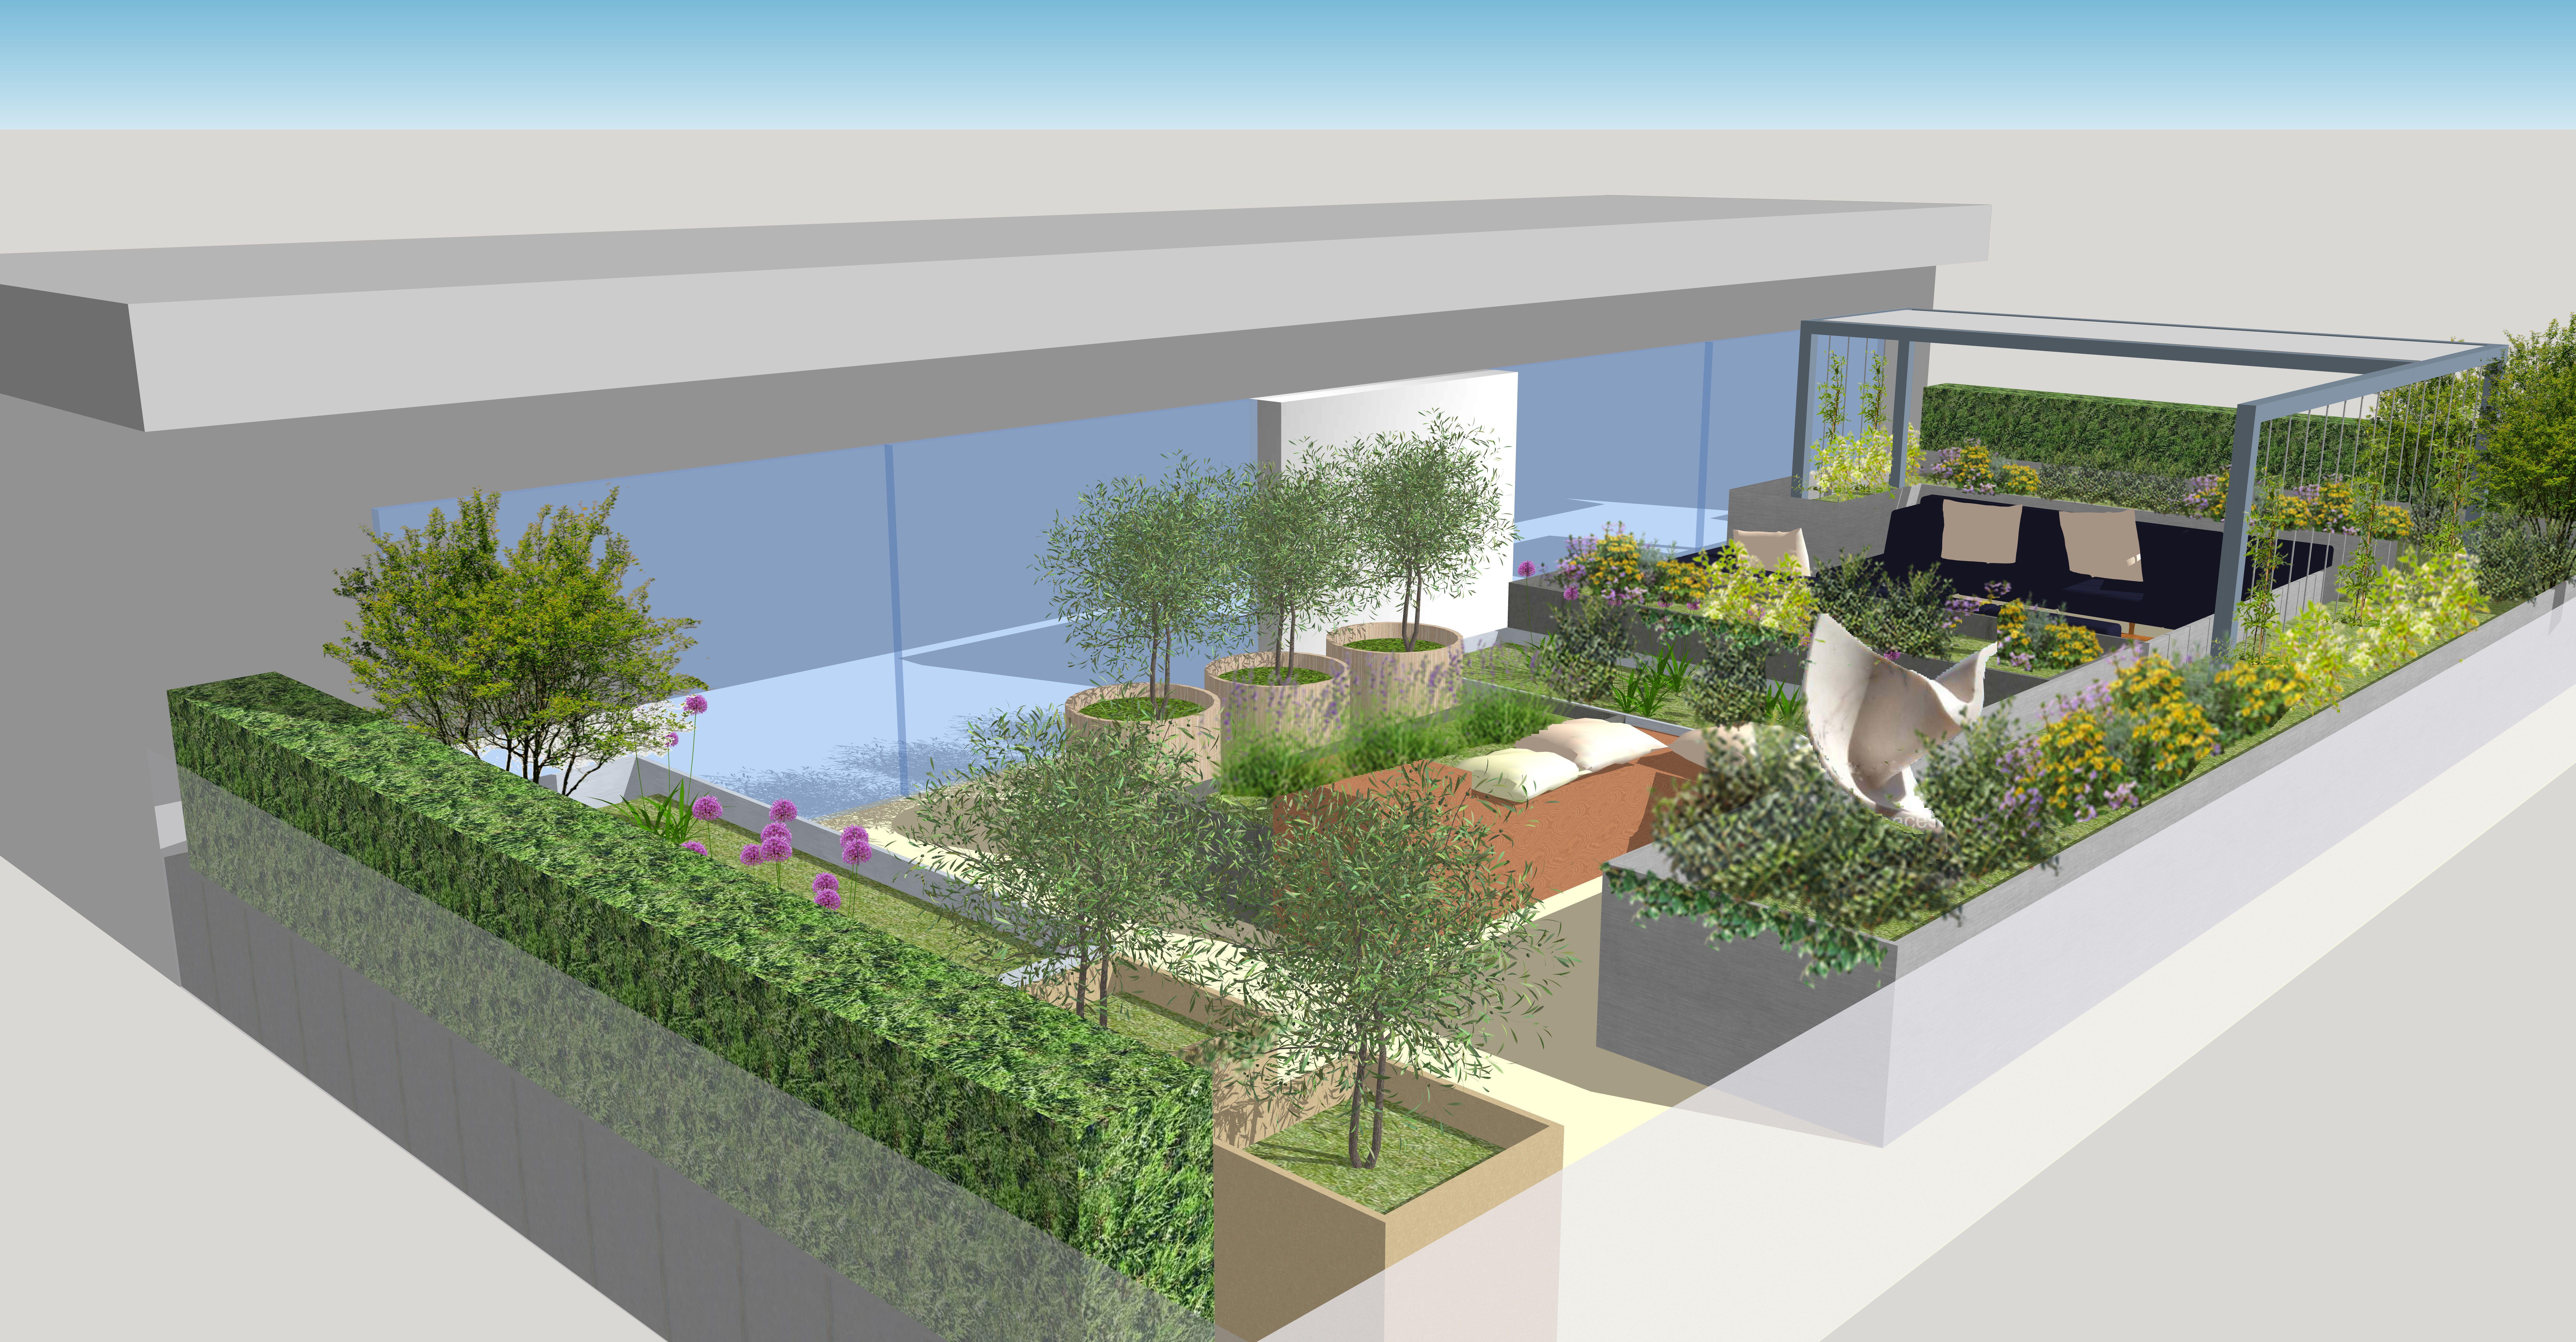 FULHAM REACH LONDON | Aralia Garden Design – Landscape & Garden Design